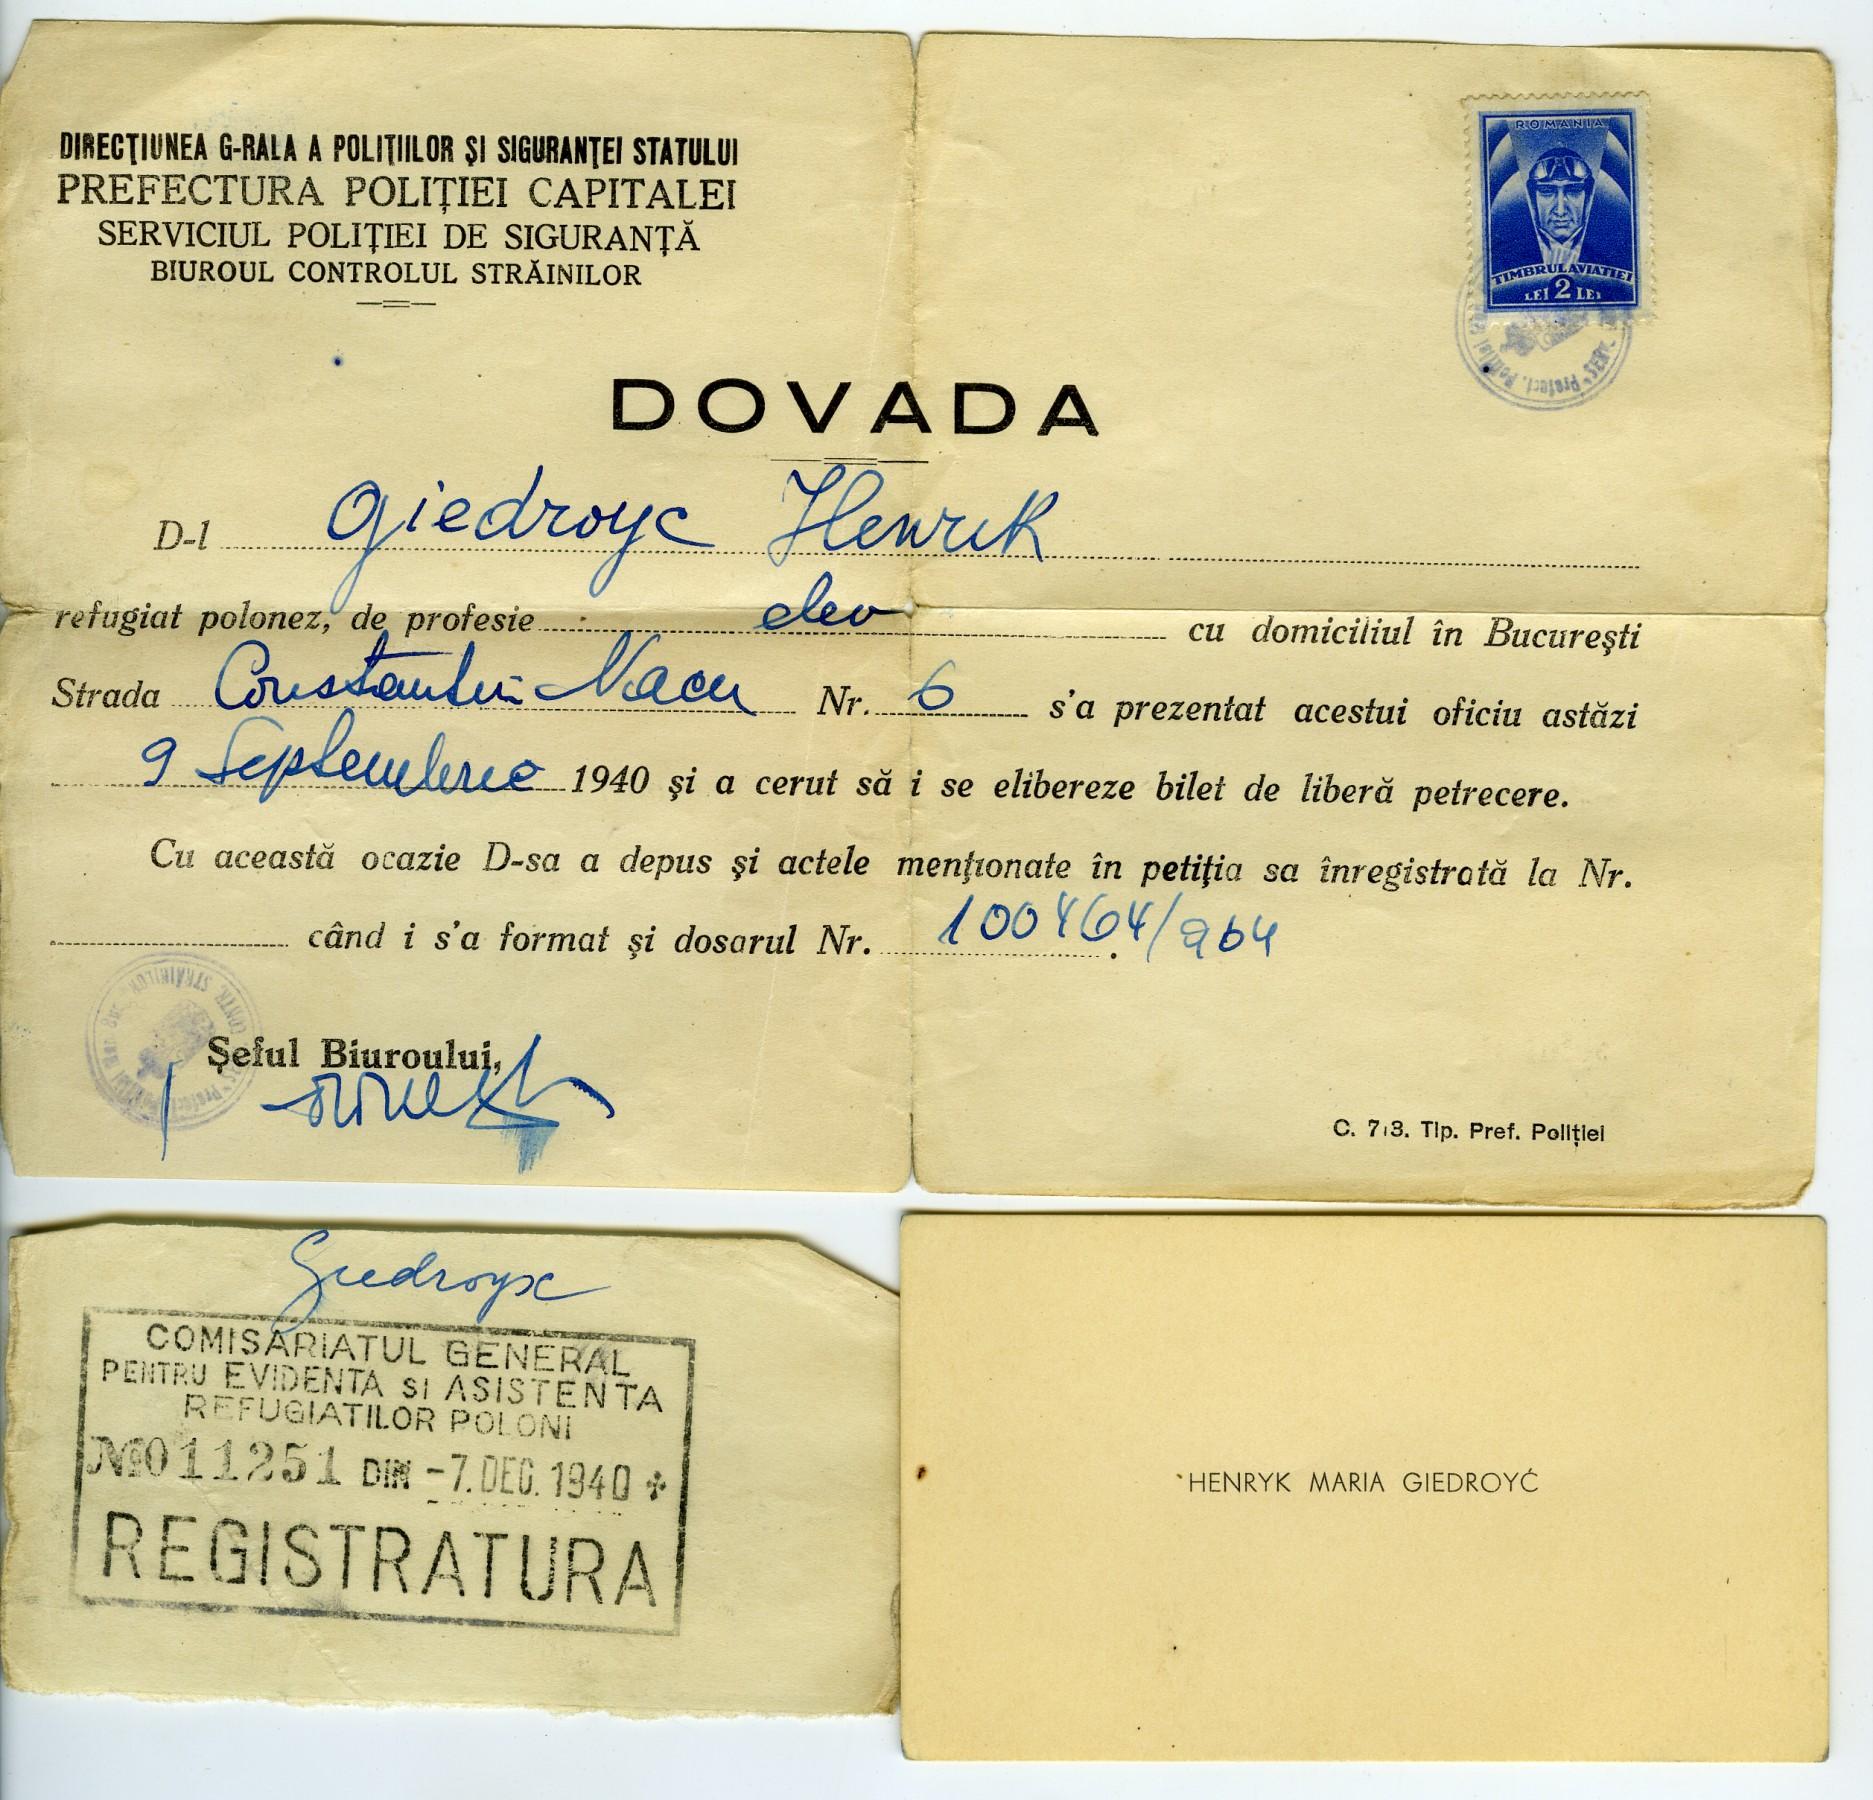 <div class='inner-box'><div class='close-desc'></div><span class='opis'>Zaświadczenie z prefektury w Bukareszcie, 1940 r.</span><div class='clearfix'></div><span>Sygn. AB00035</span><div class='clearfix'></div><span>&copy; Instytut Literacki</span></div>